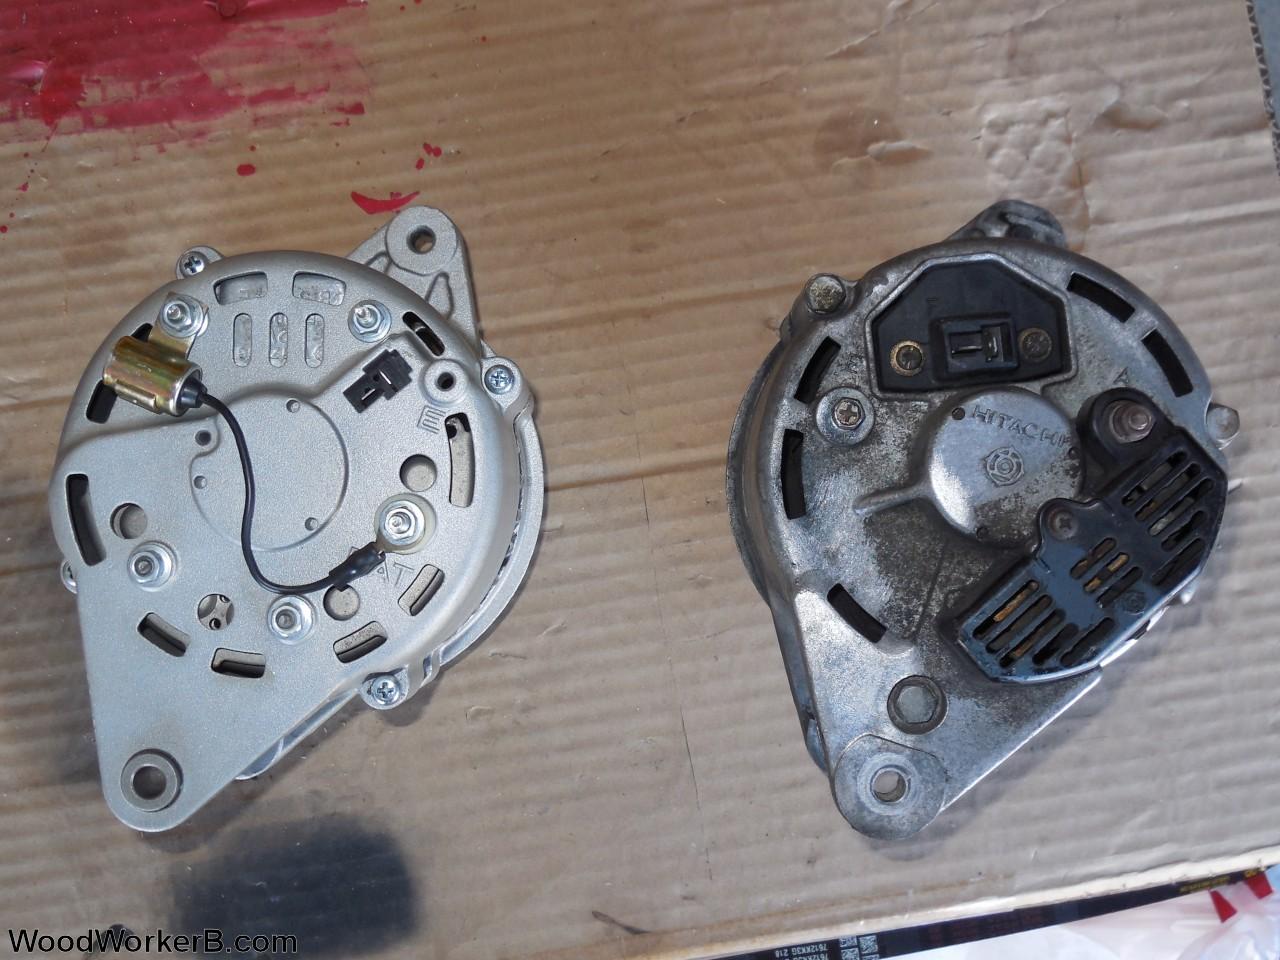 13av60kg011 240z alternator upgrade detail showing diode attachment  into wiring on alternator replacement, alternator generator,